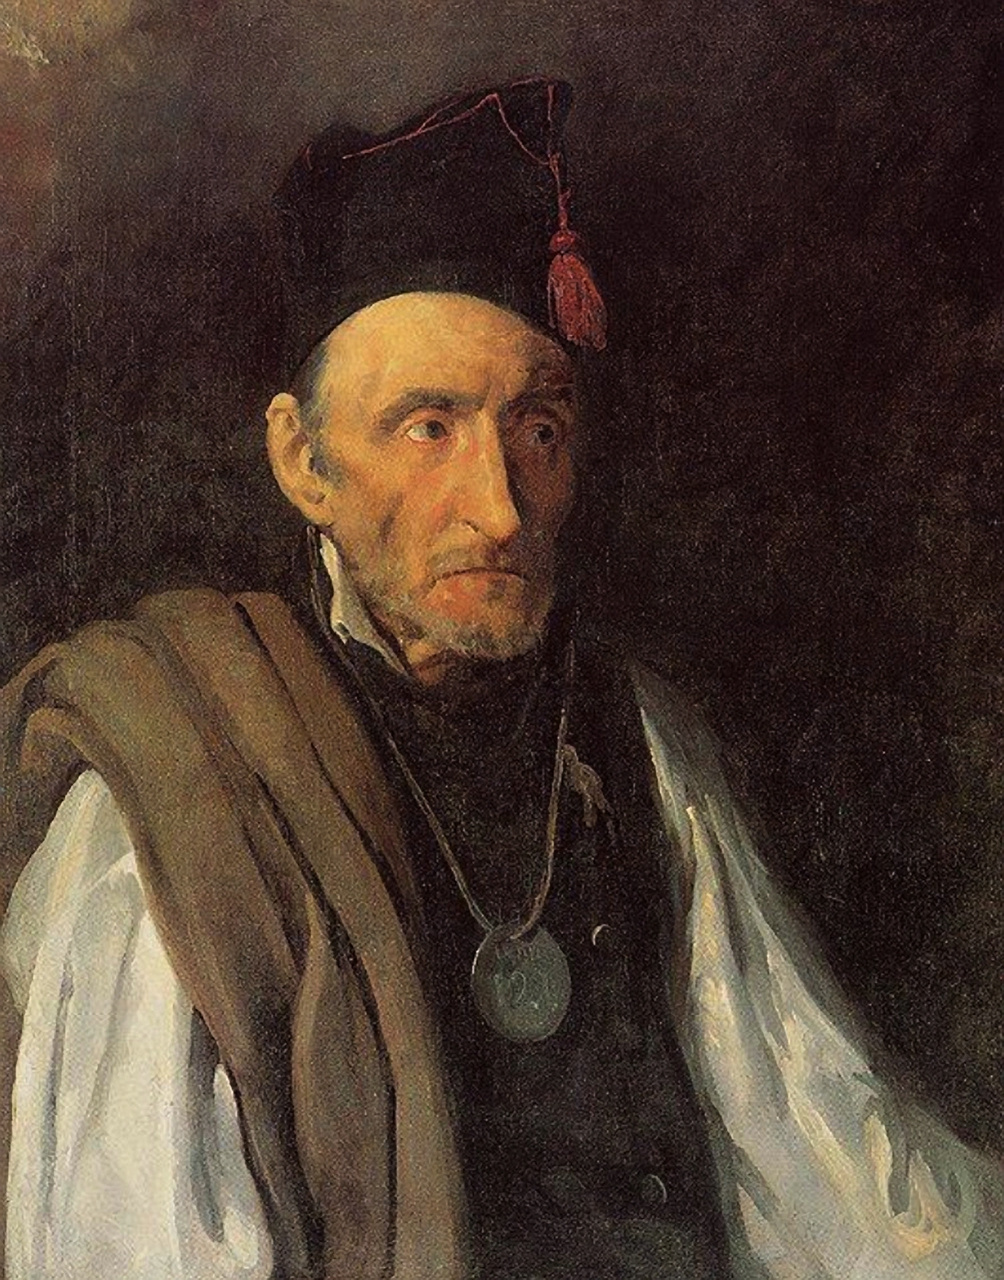 Théodore Géricault. Insane, imagining himself commander